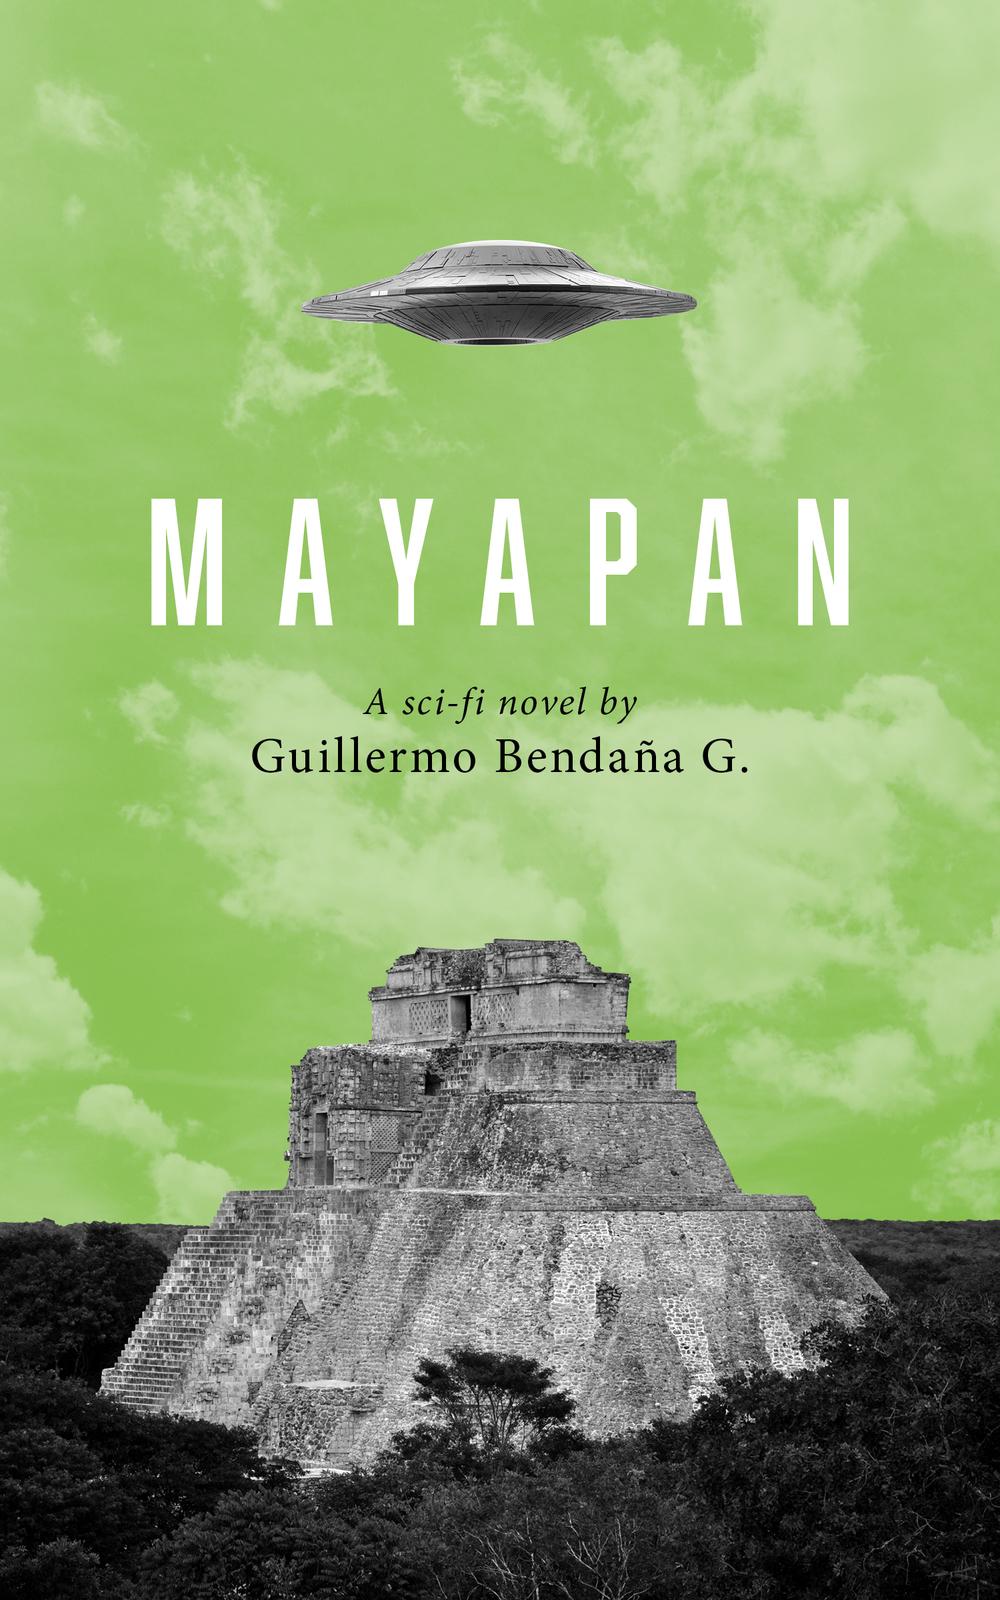 Mayapancover.jpg